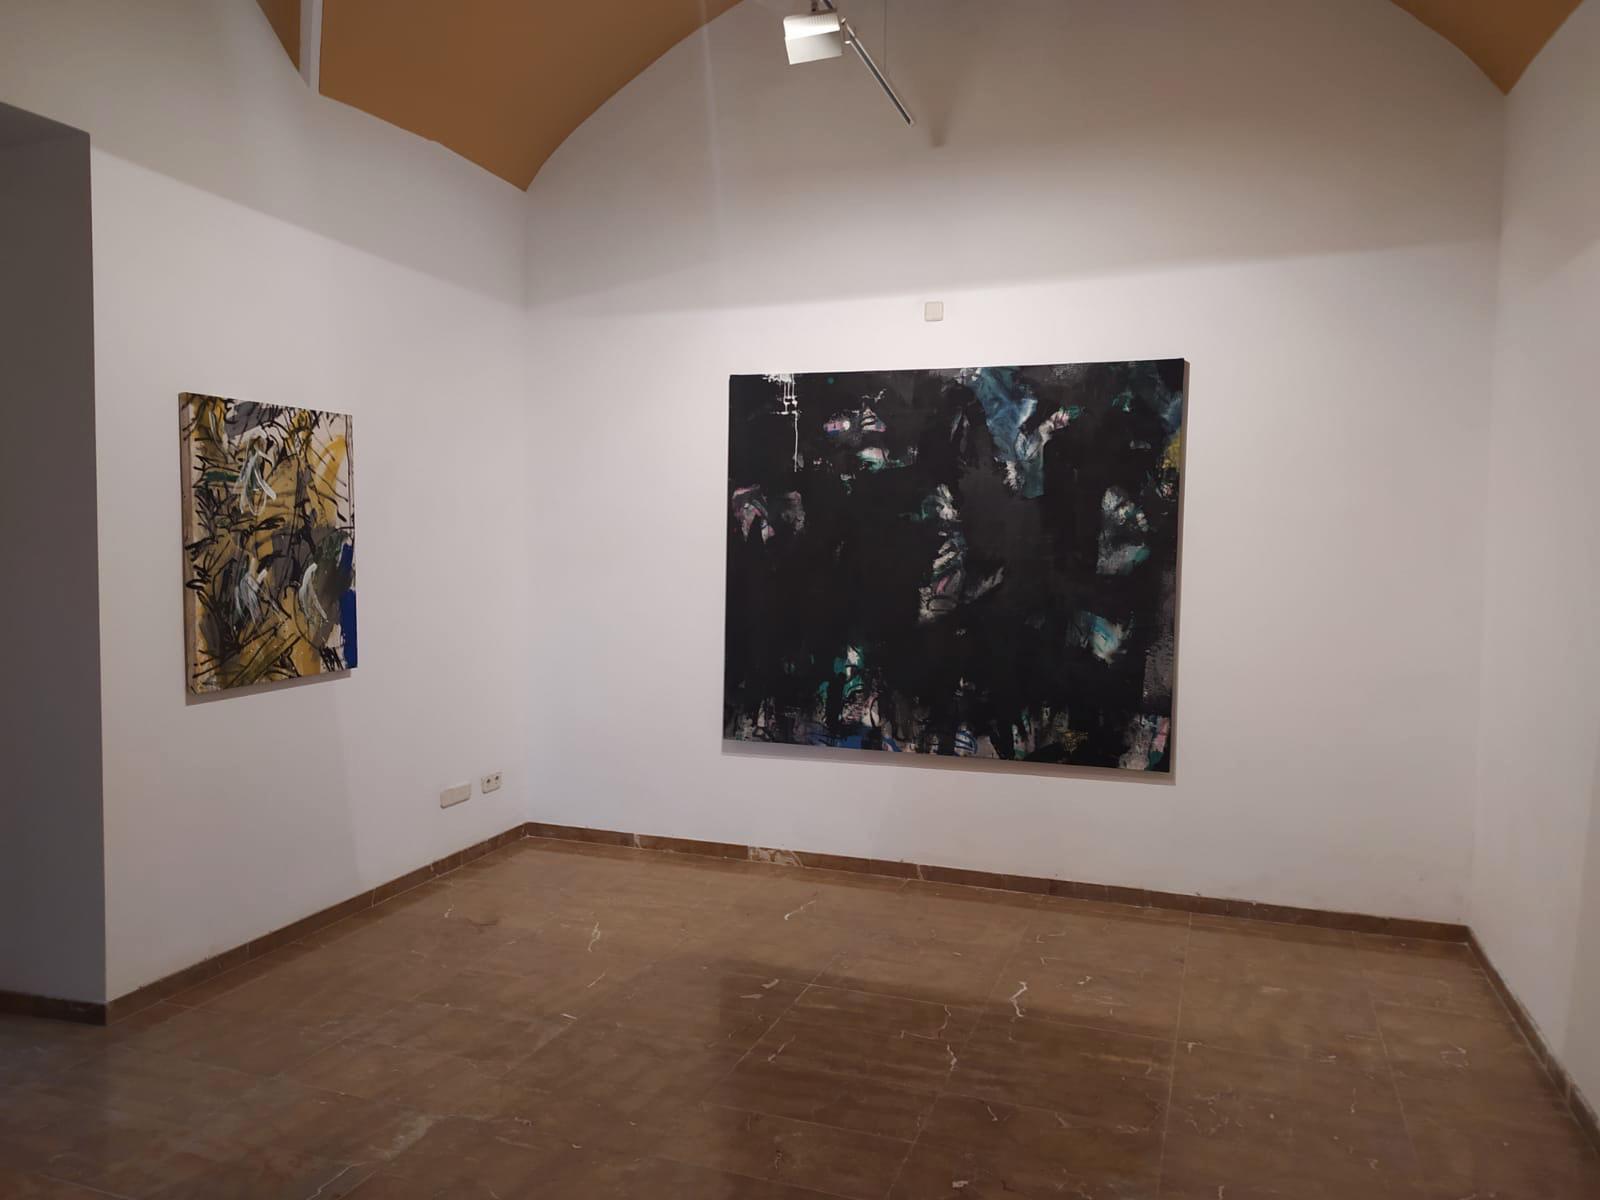 arte urbano joan àvila Exposición de arte